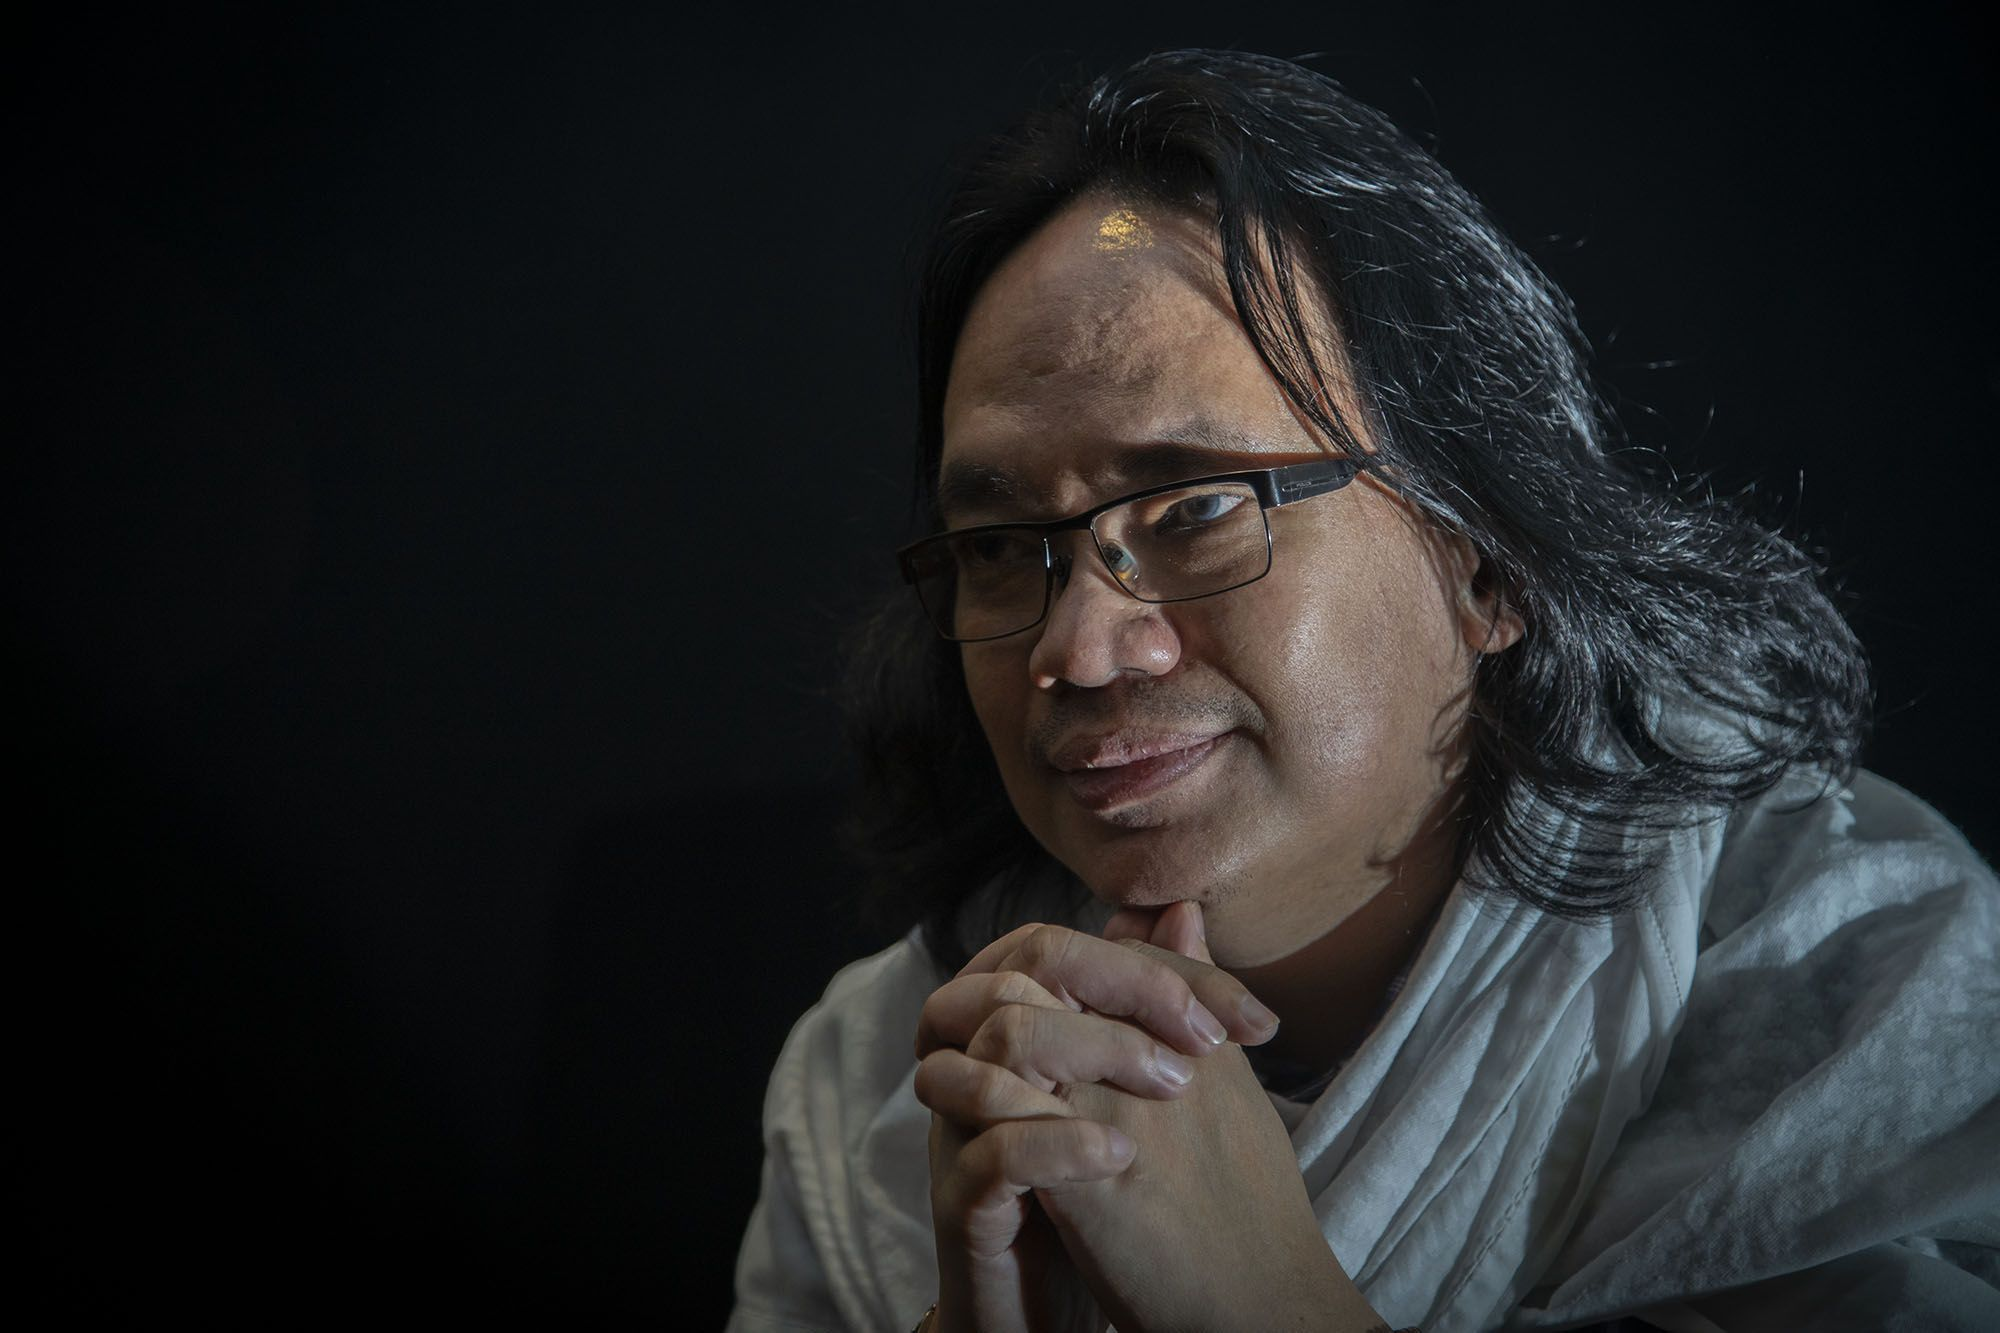 Mengenal Prof. Nadirsyah Hosen, Kiai NU yang Juga Dosen Tetap Universitas  Monash, Australia Halaman 1 - Kompasiana.com